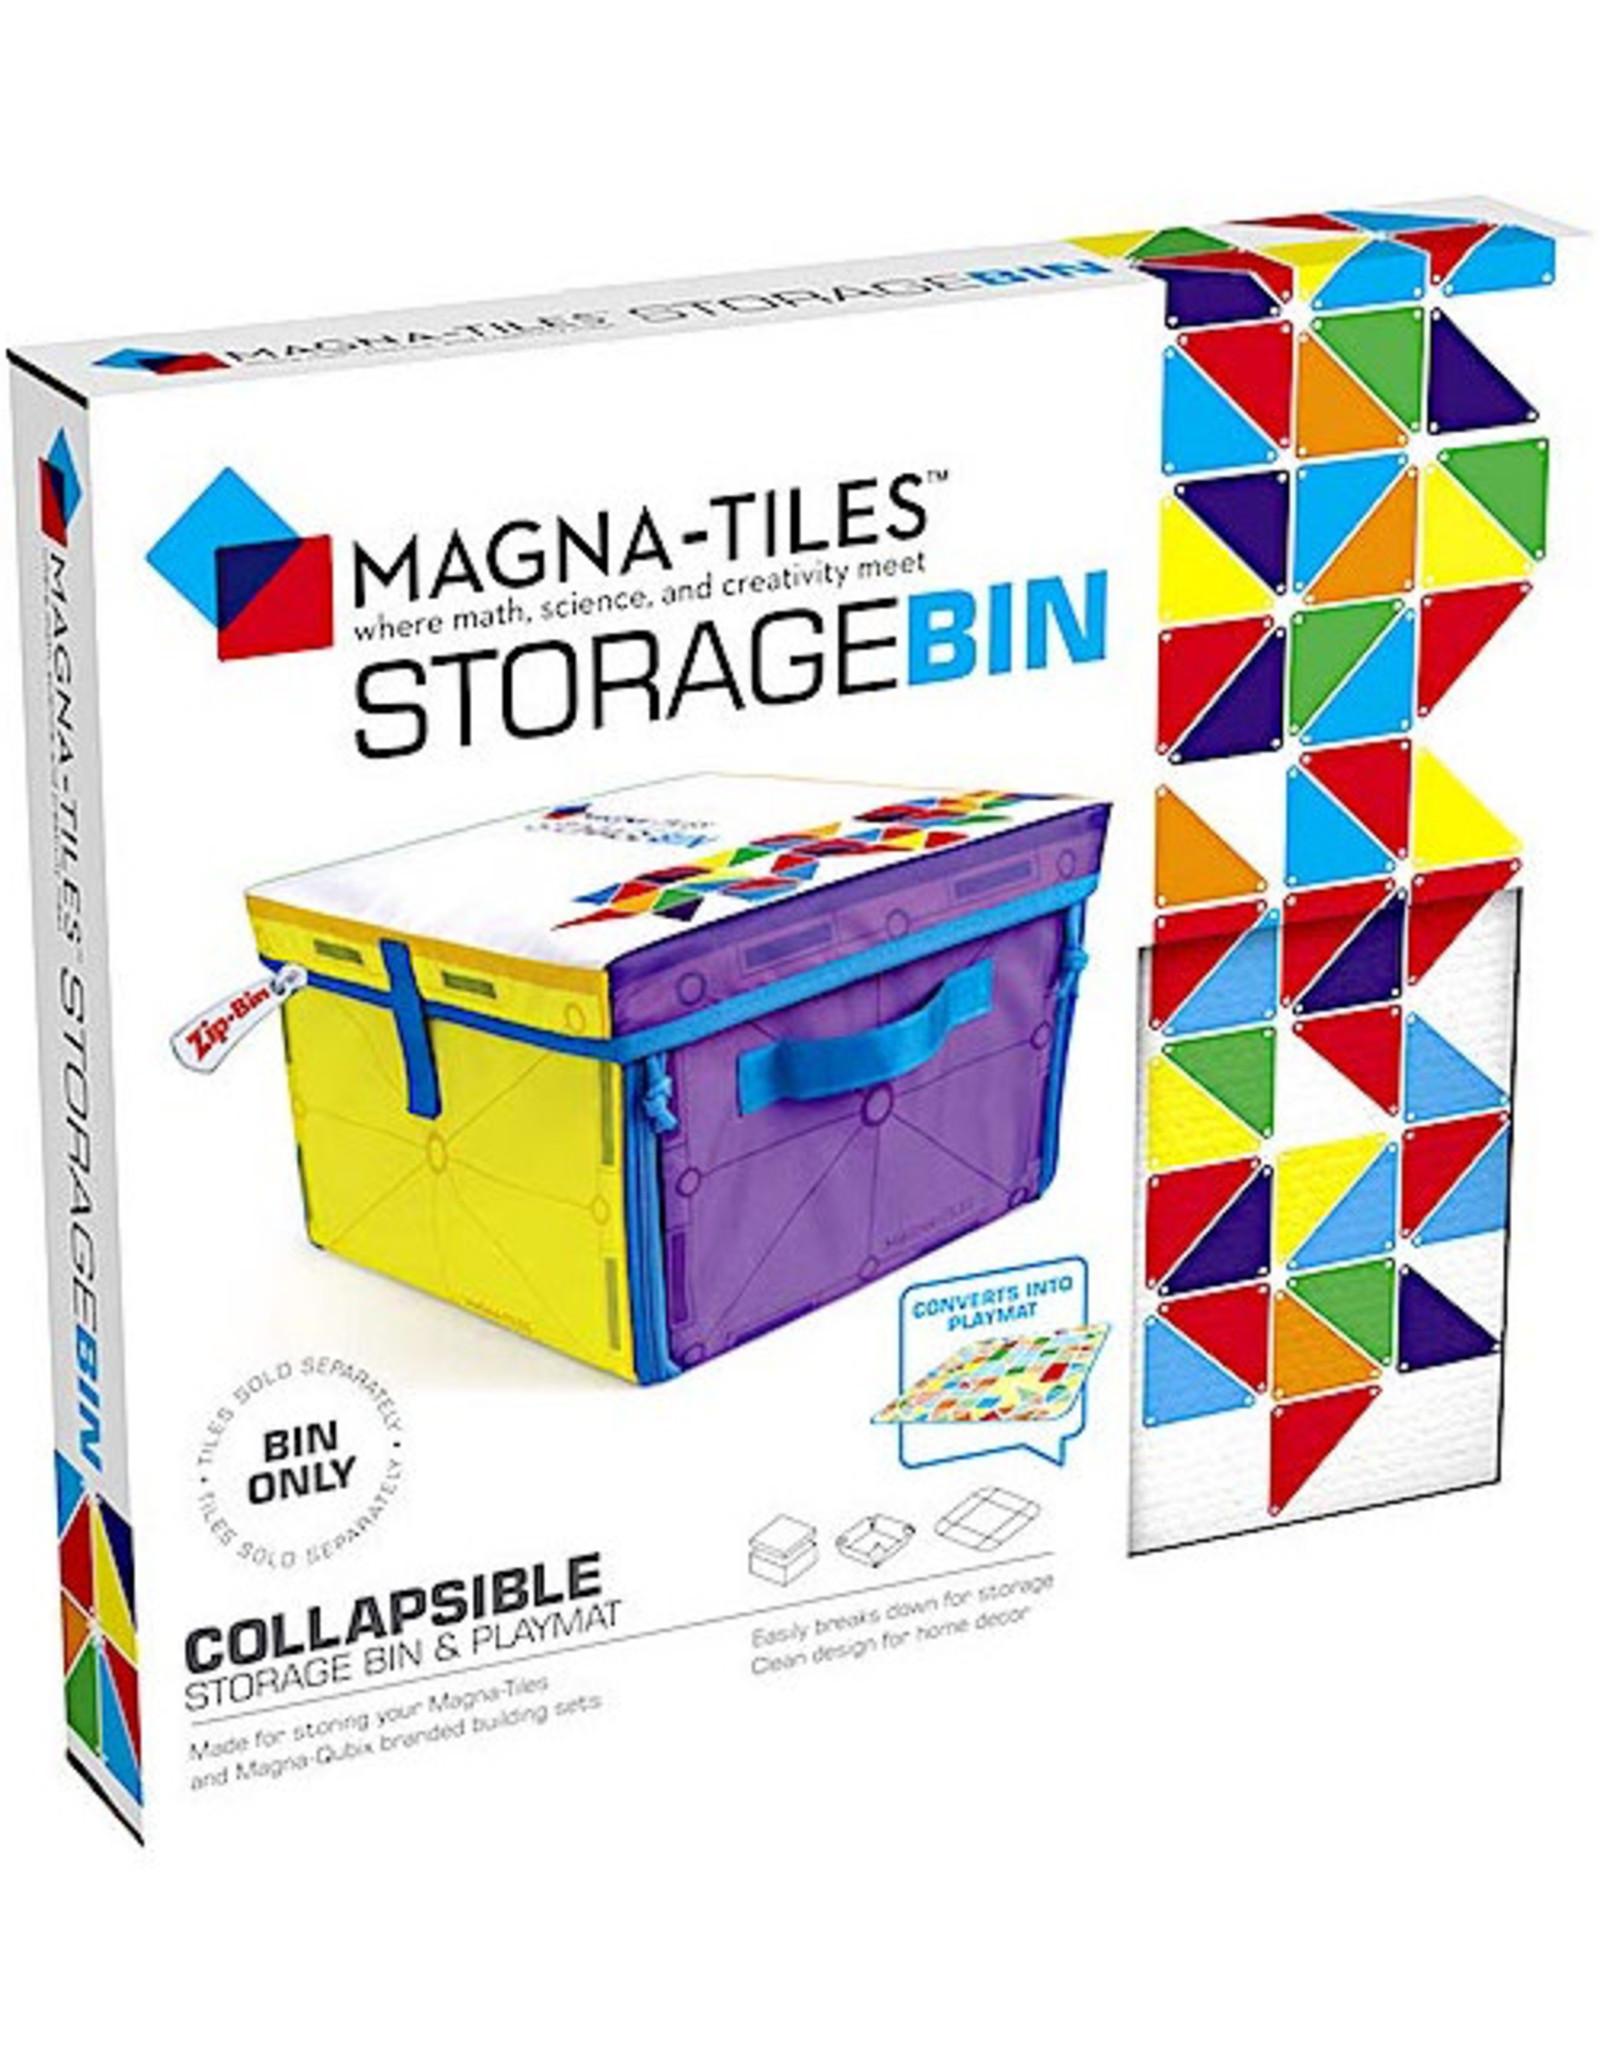 Magna Tiles Magna- Tiles Storage Bin